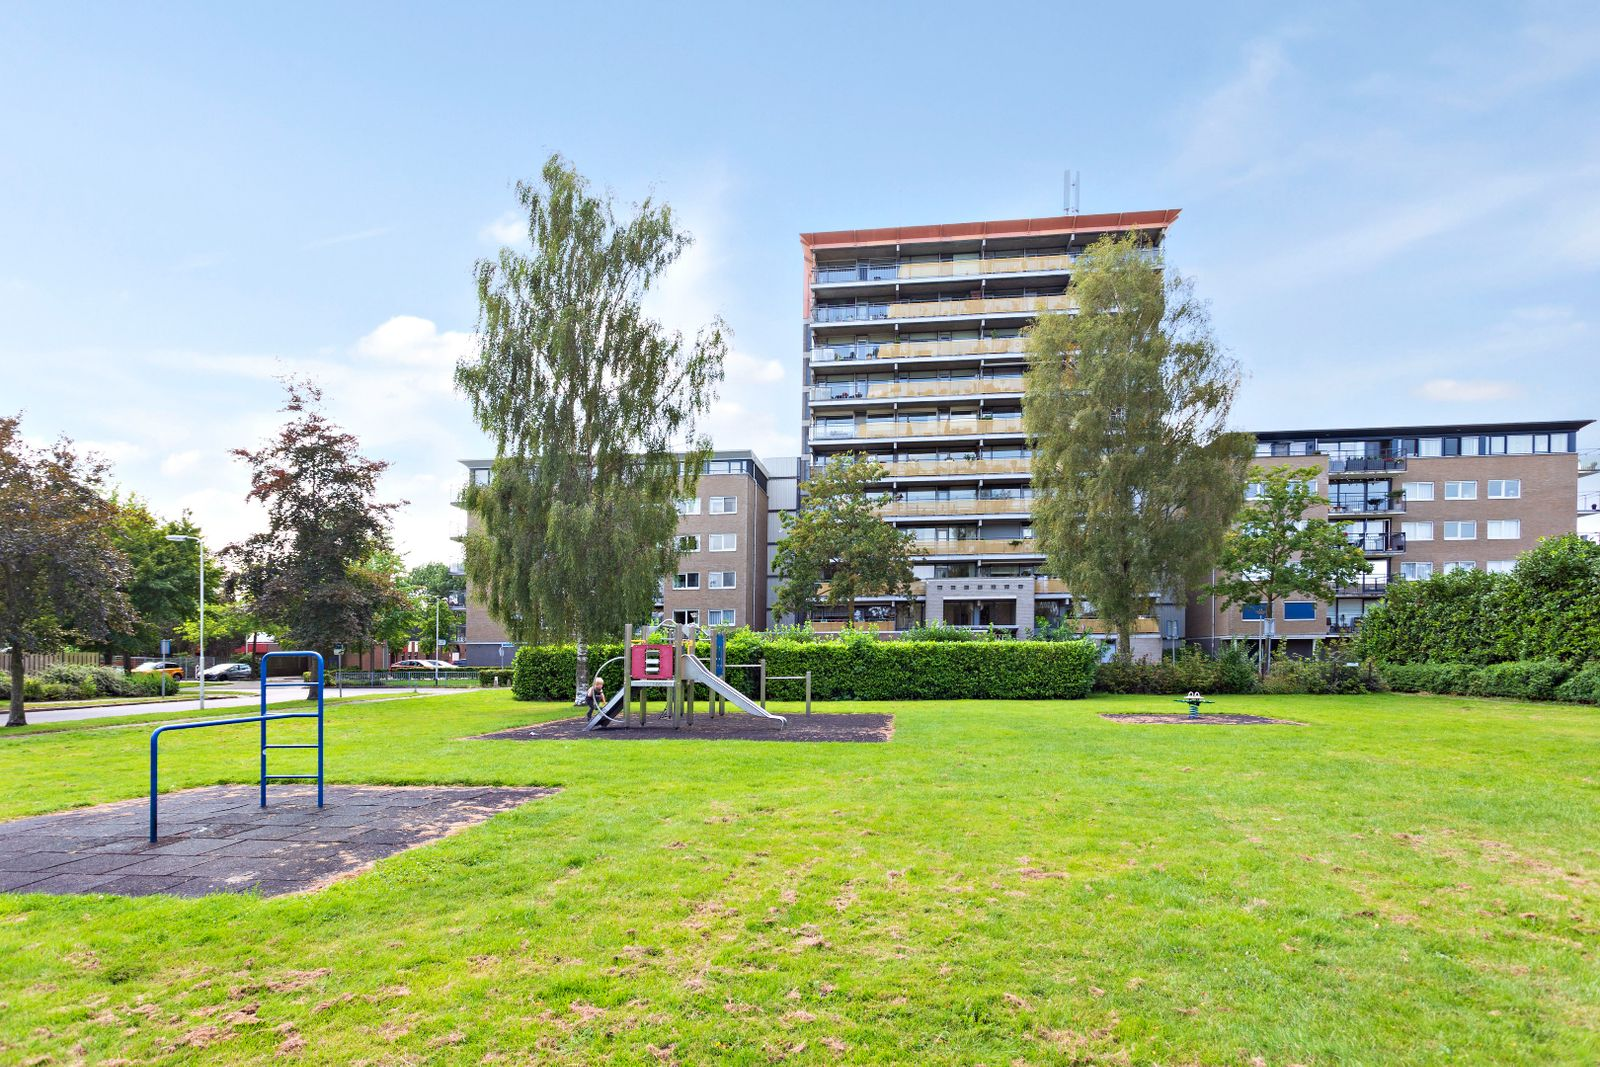 Abeliadonk 13, Roosendaal